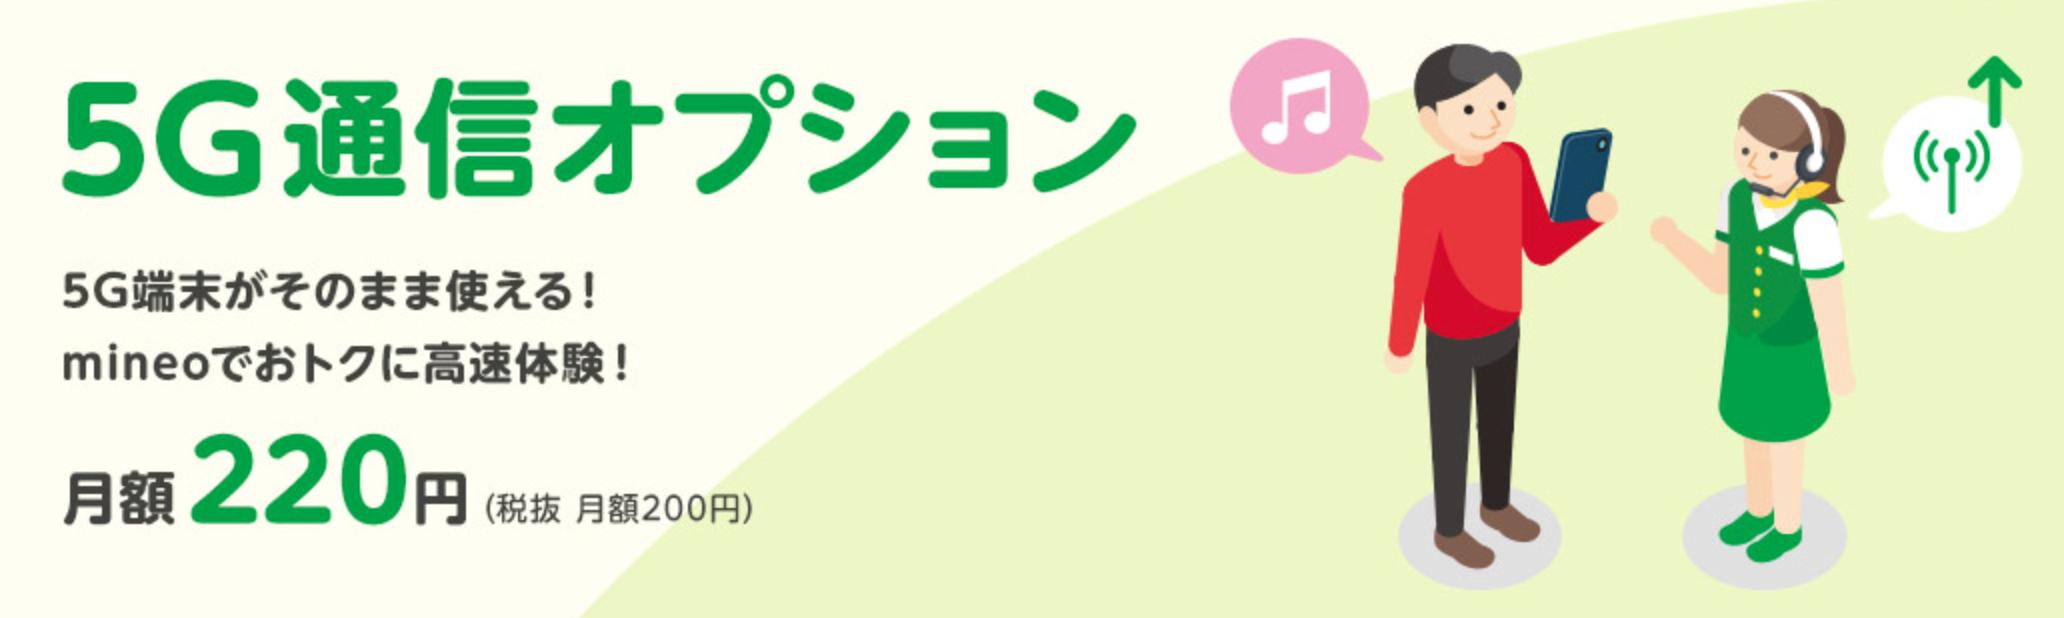 mineo_マイネオ_評判_口コミ_5G_5g_5G通信オプション